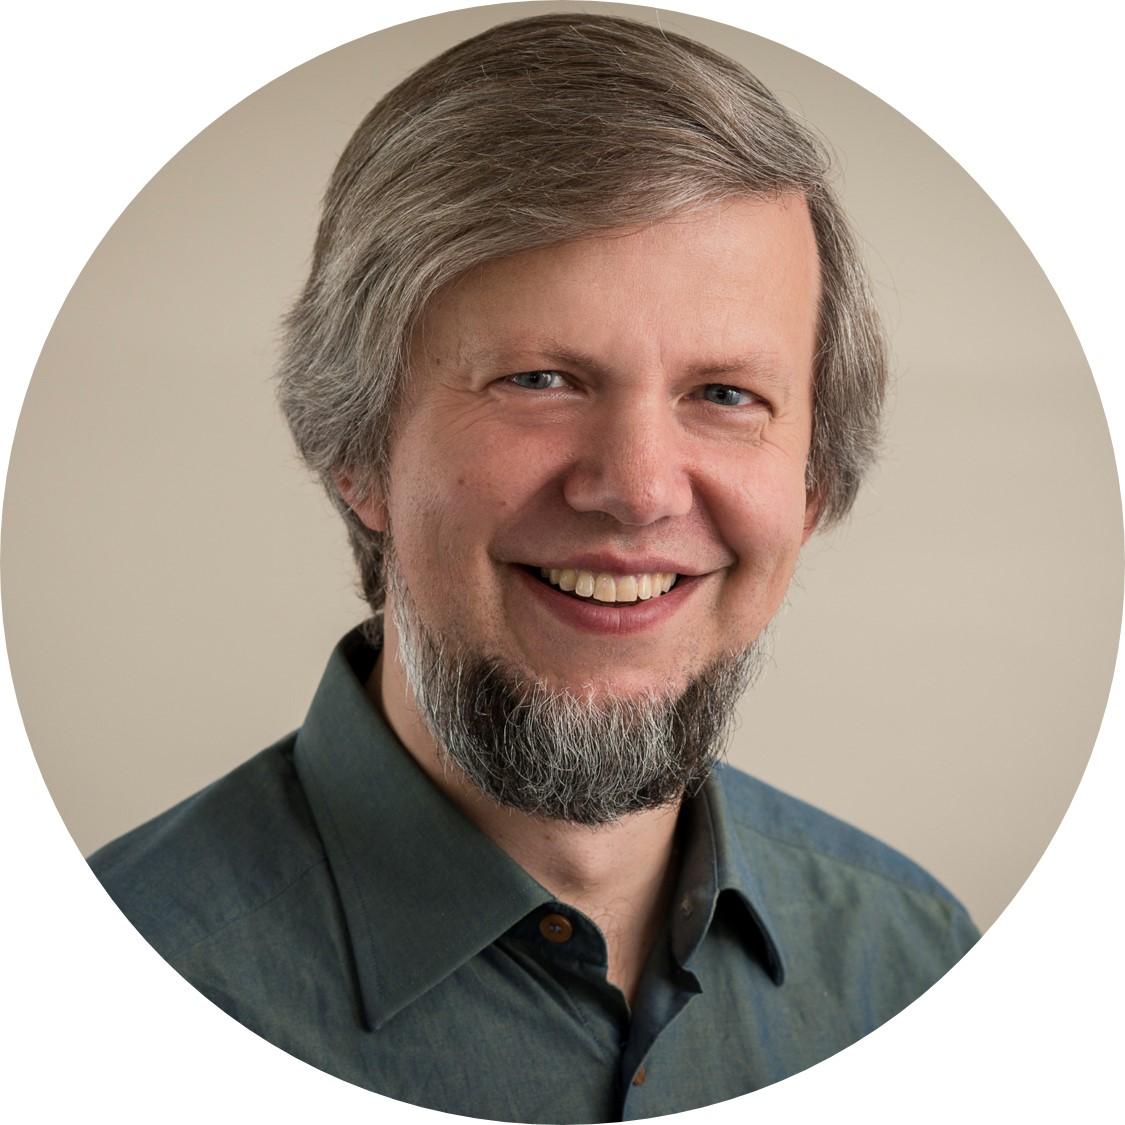 Andrew Parnasov - Ingeniero de Sistemas